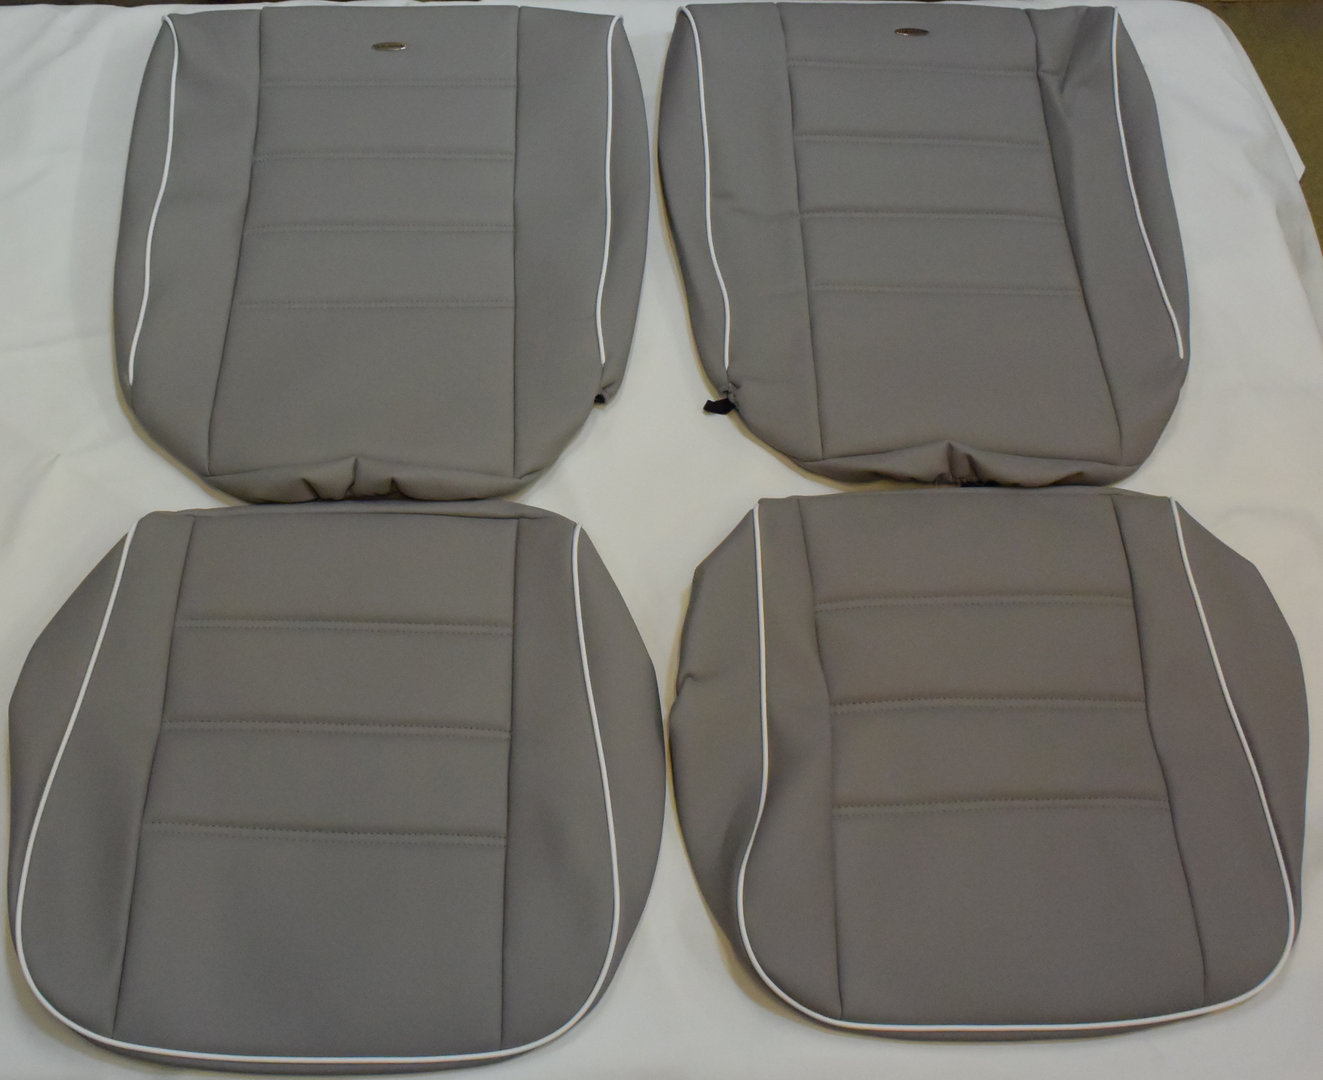 VW Käfer Limousine 08/55 - 07/57 Maß Sitzbezüge in grau